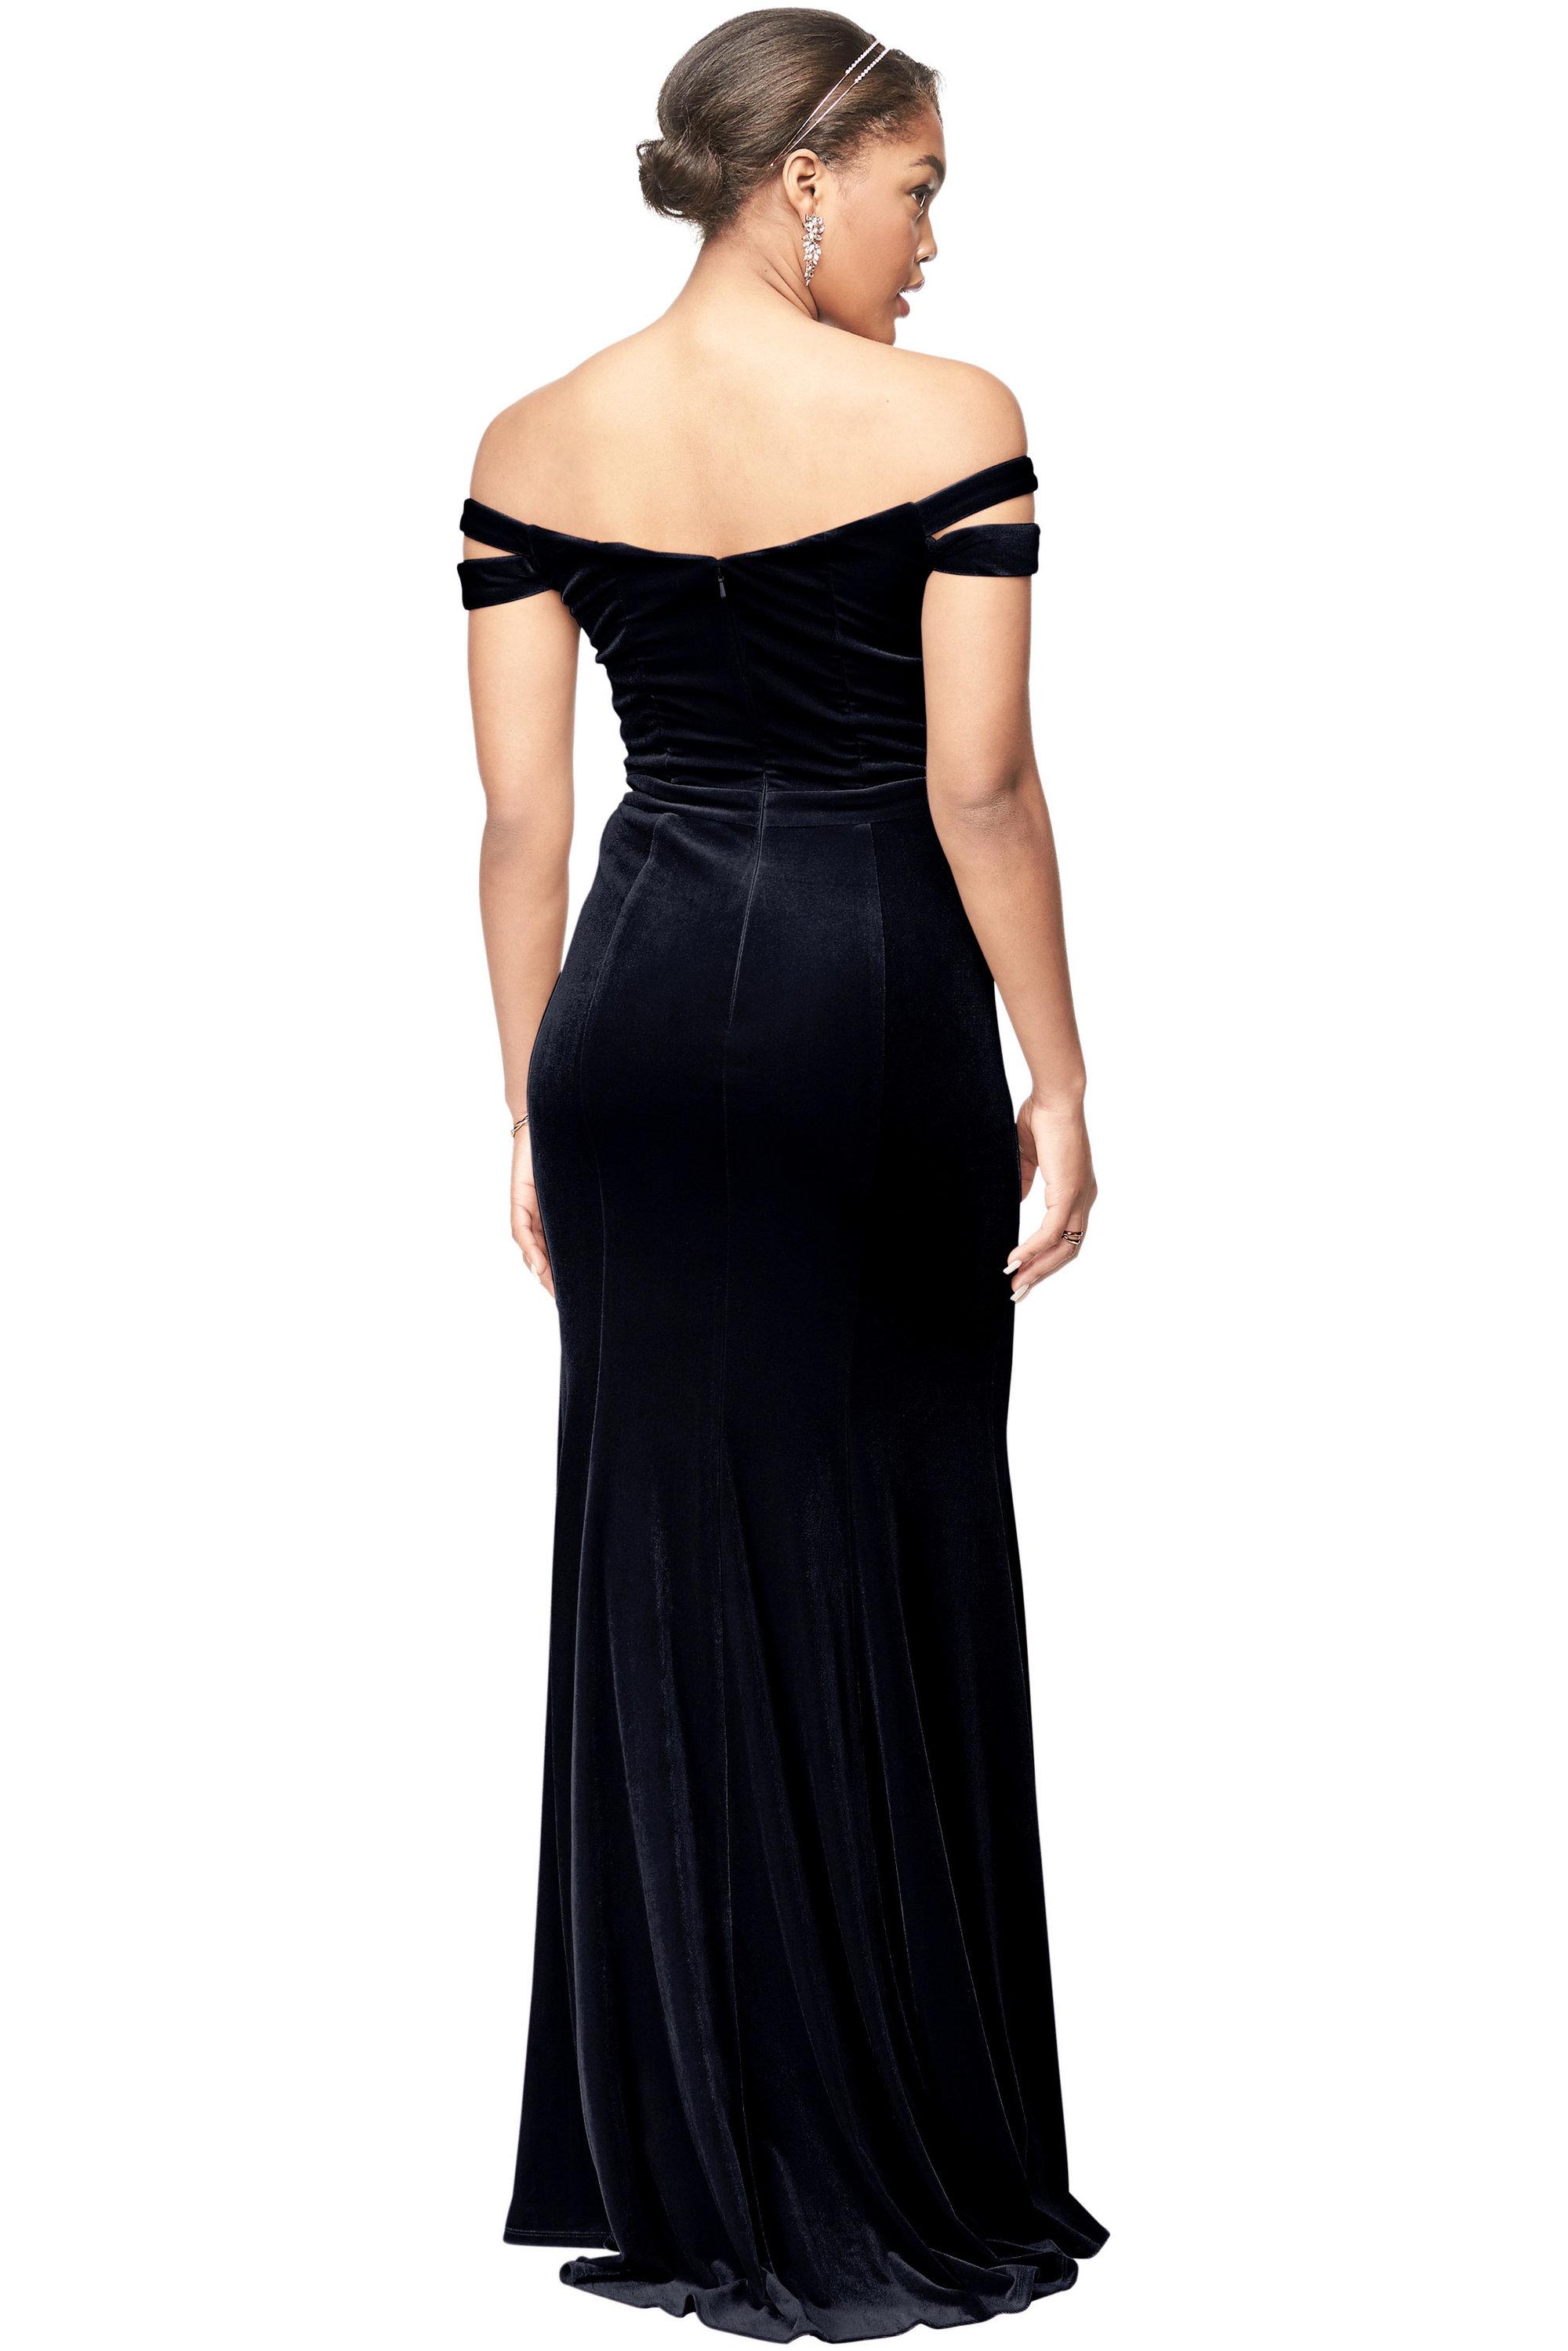 Bill Levkoff MIDNIGHT Stretch Velvet Off The Shoulder A-Line gown, $230.00 Back